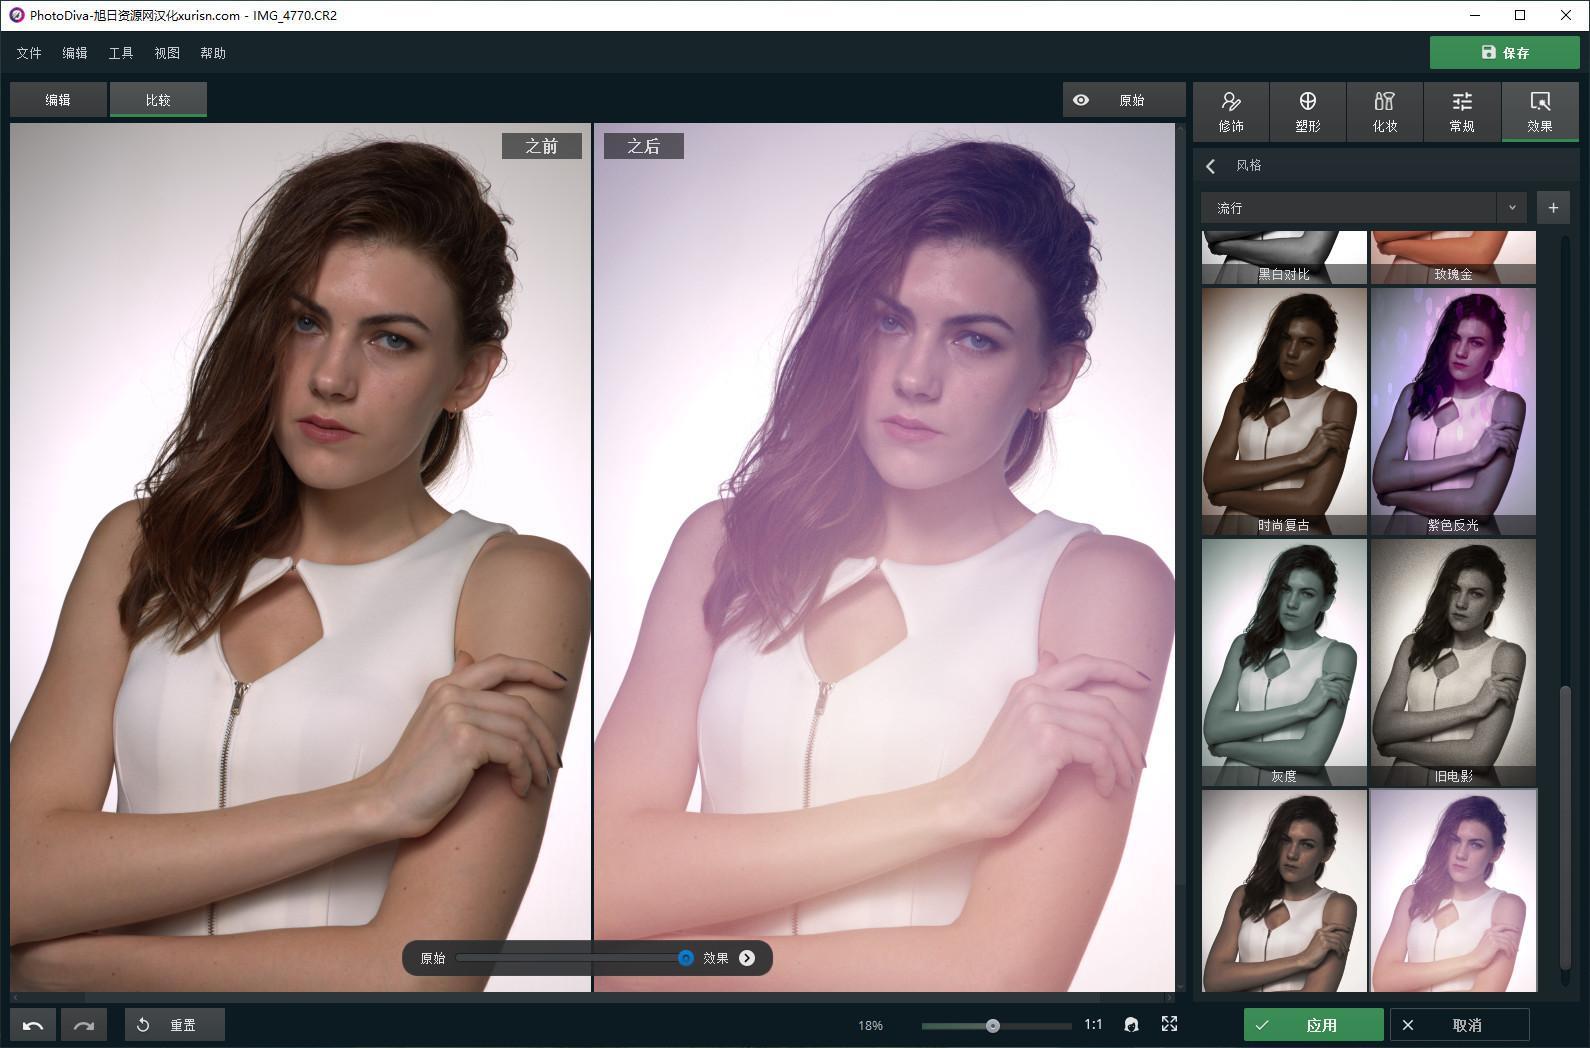 VIP资源-PhotoDiva Pro 3.0汉化版 快捷人像美容塑形修肤化妆照片编辑器(7)